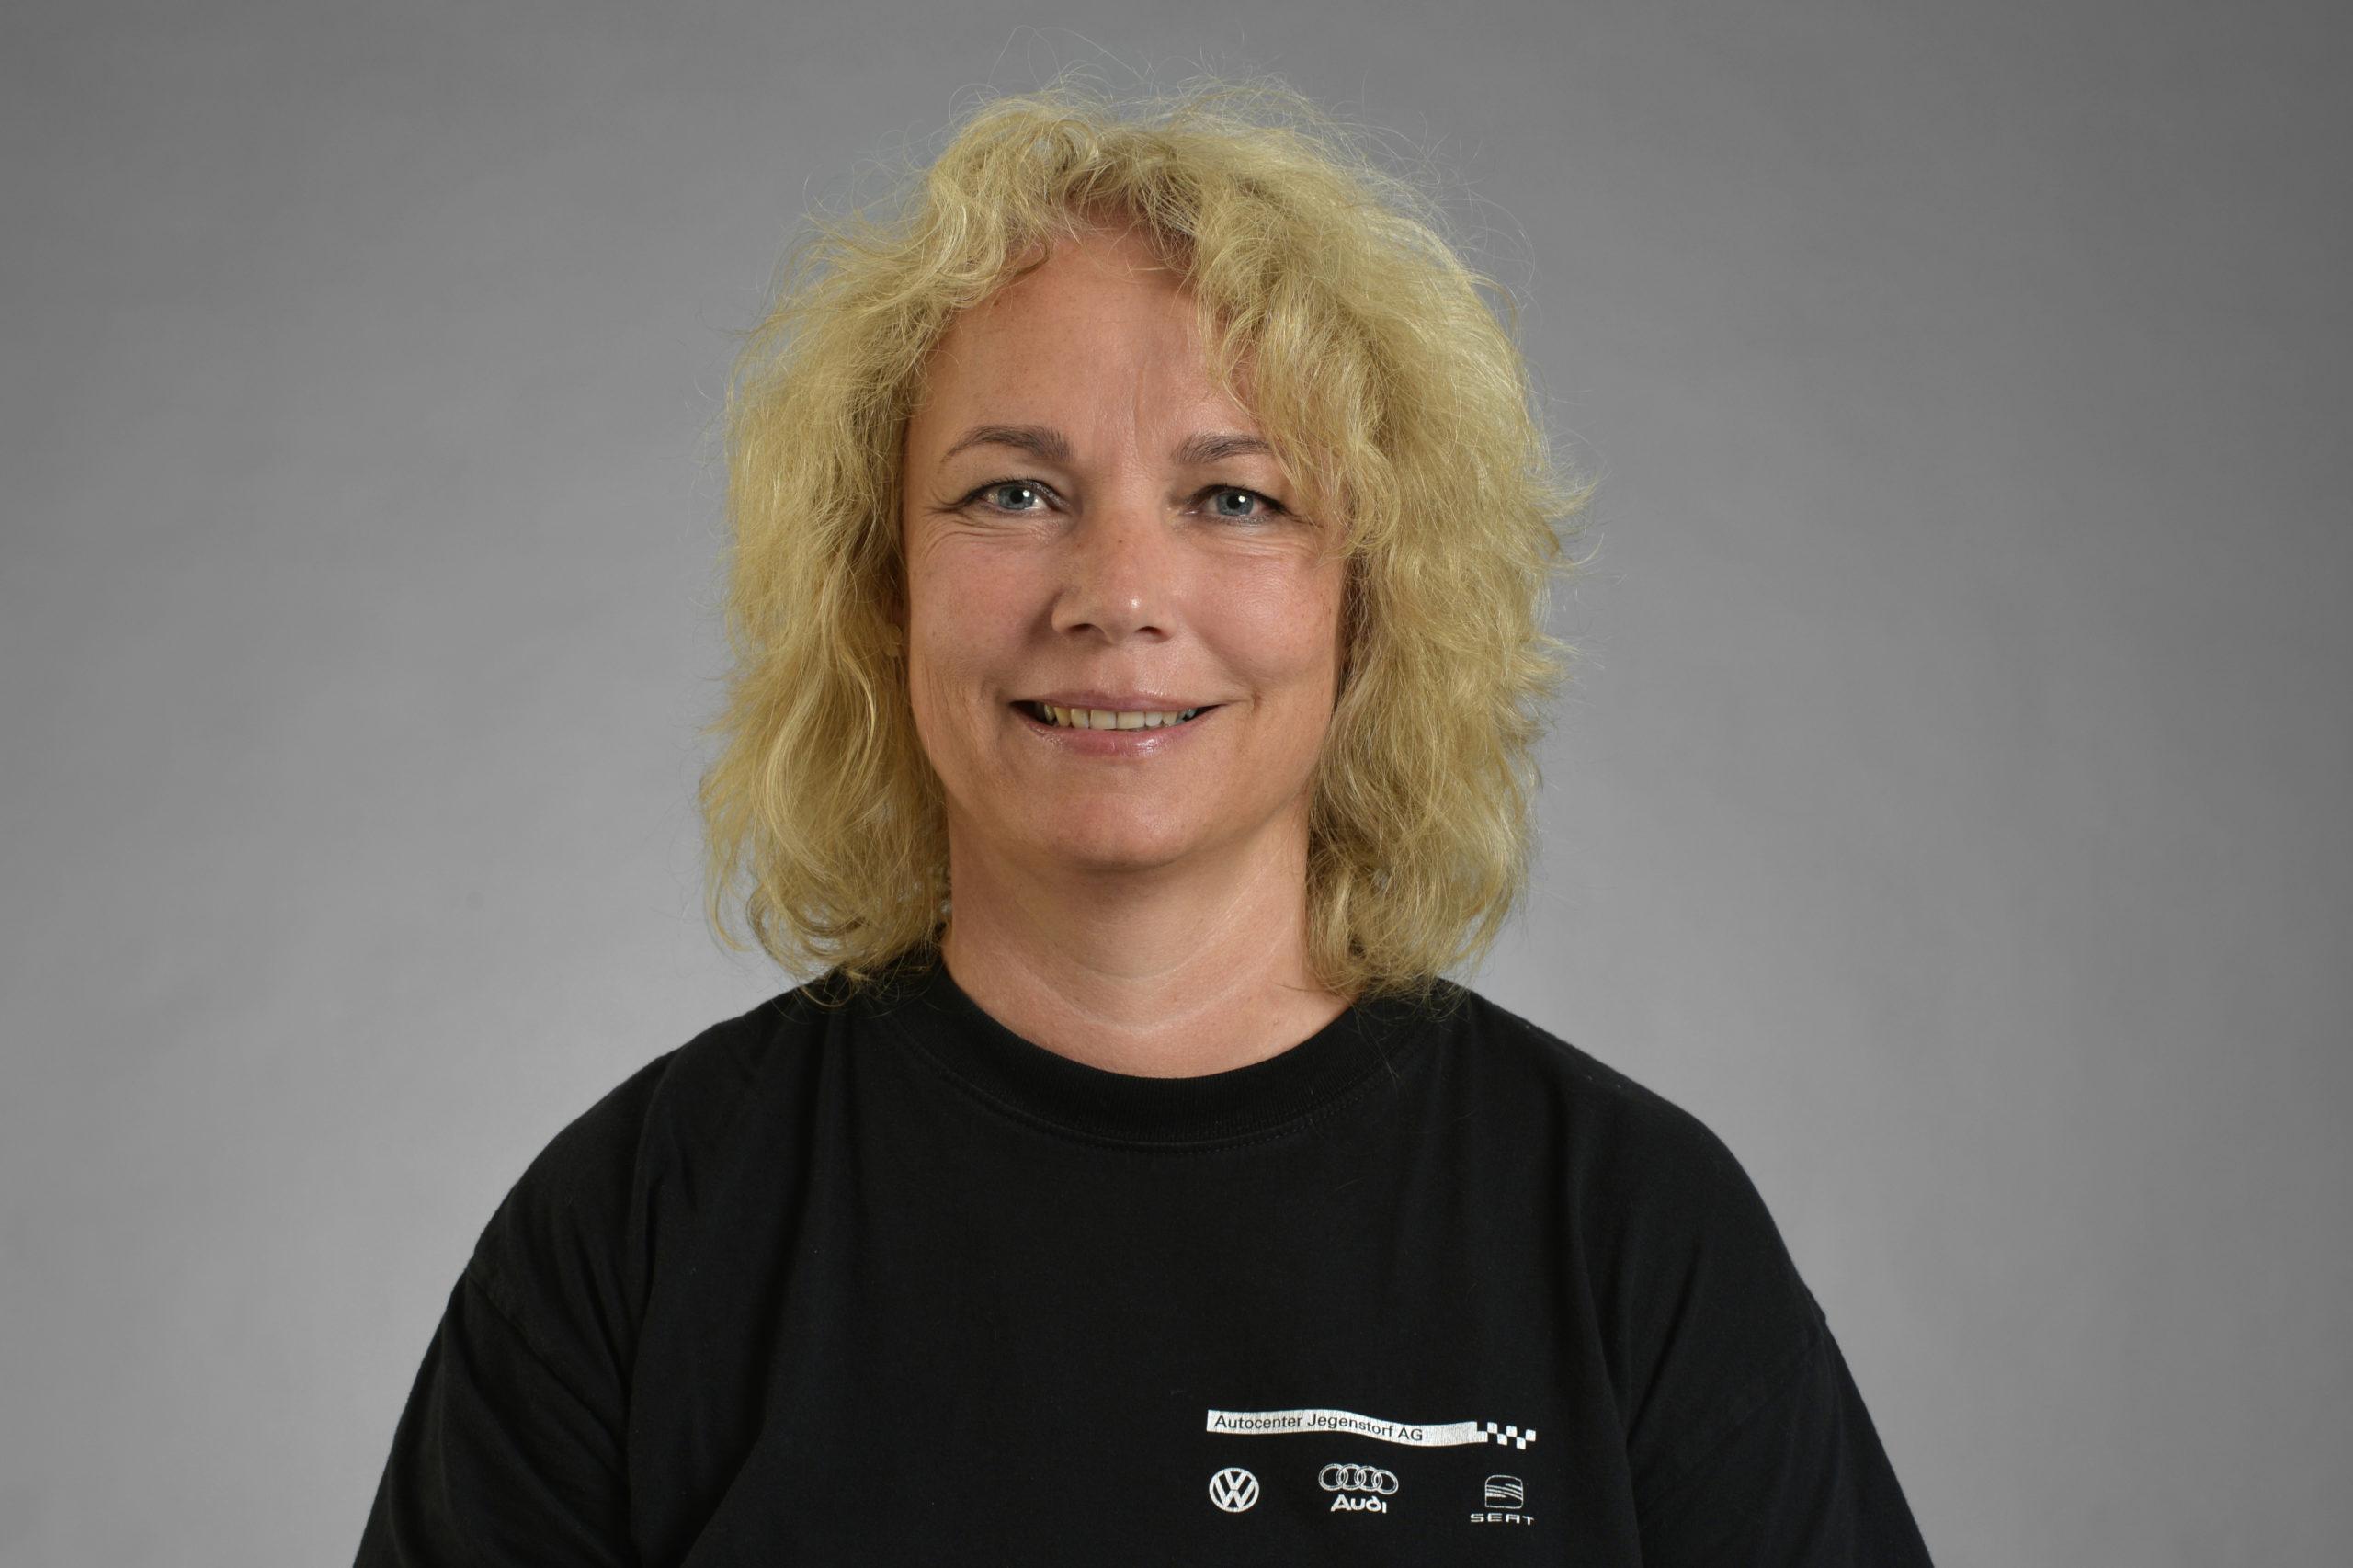 Silvia Huber